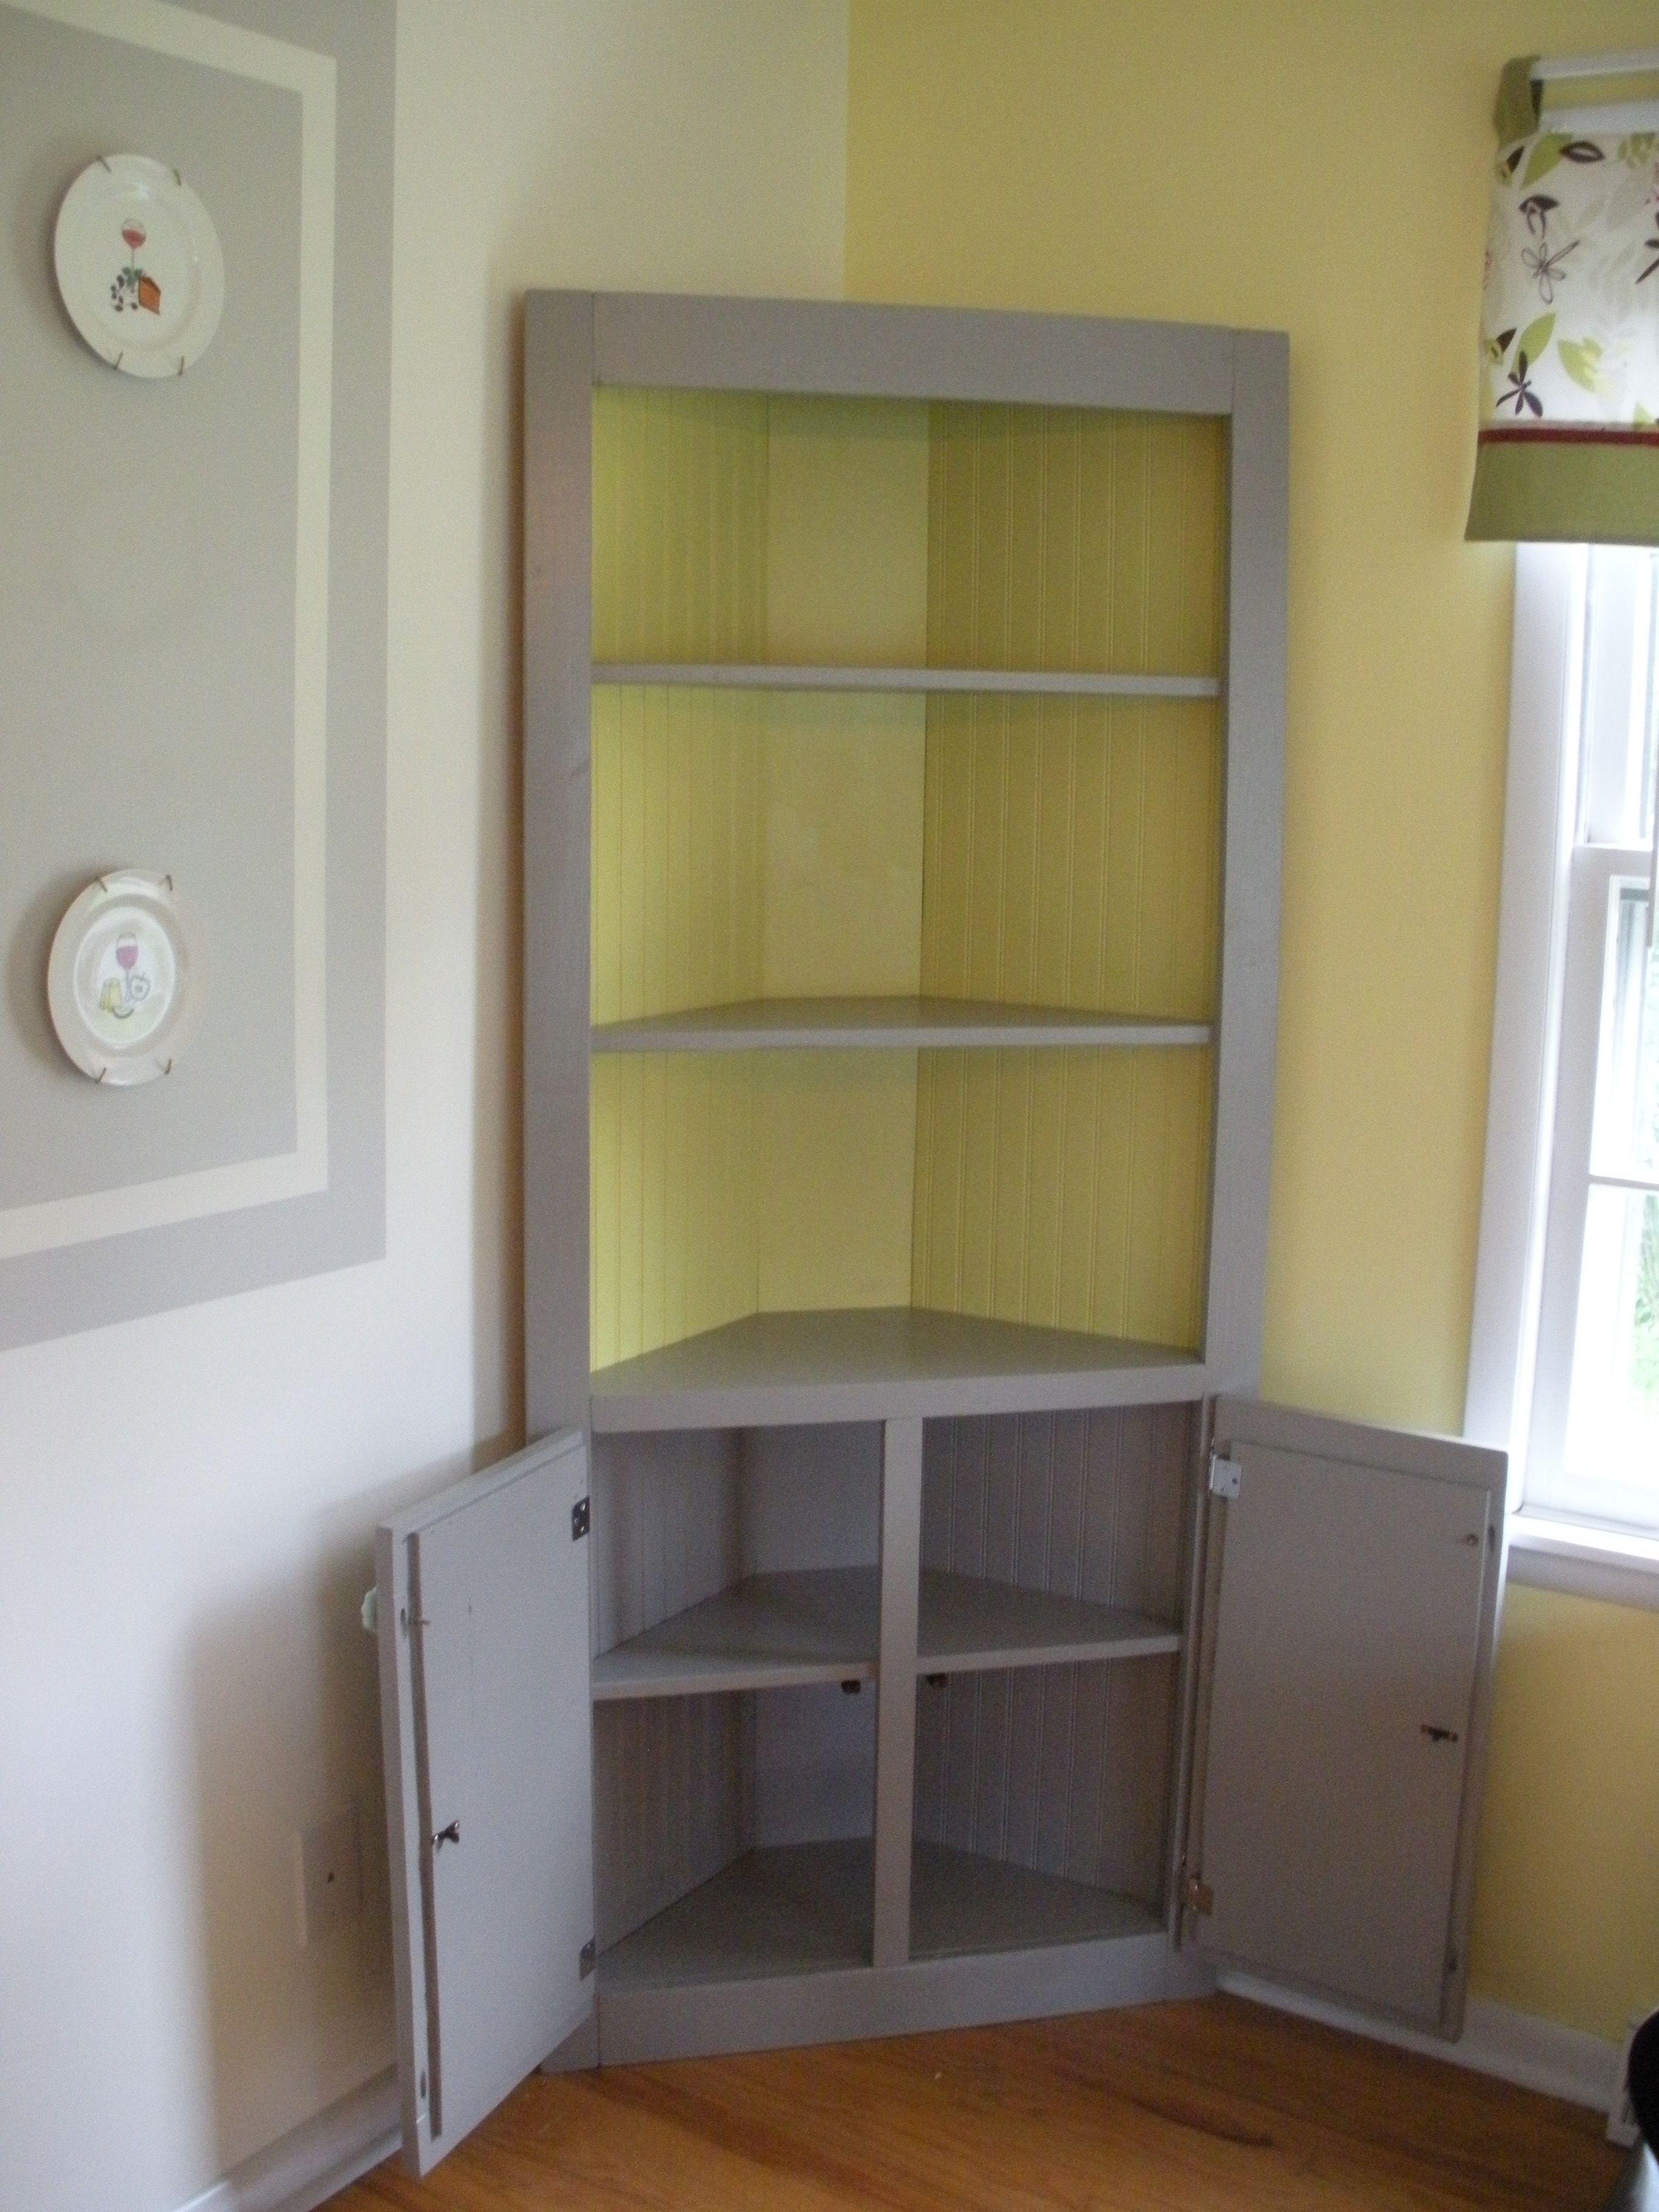 17 Trendiest Dining Room Ideas For 2019 Trendy Dining Room Corner Storage Cabinet Bedroom Furniture Redo